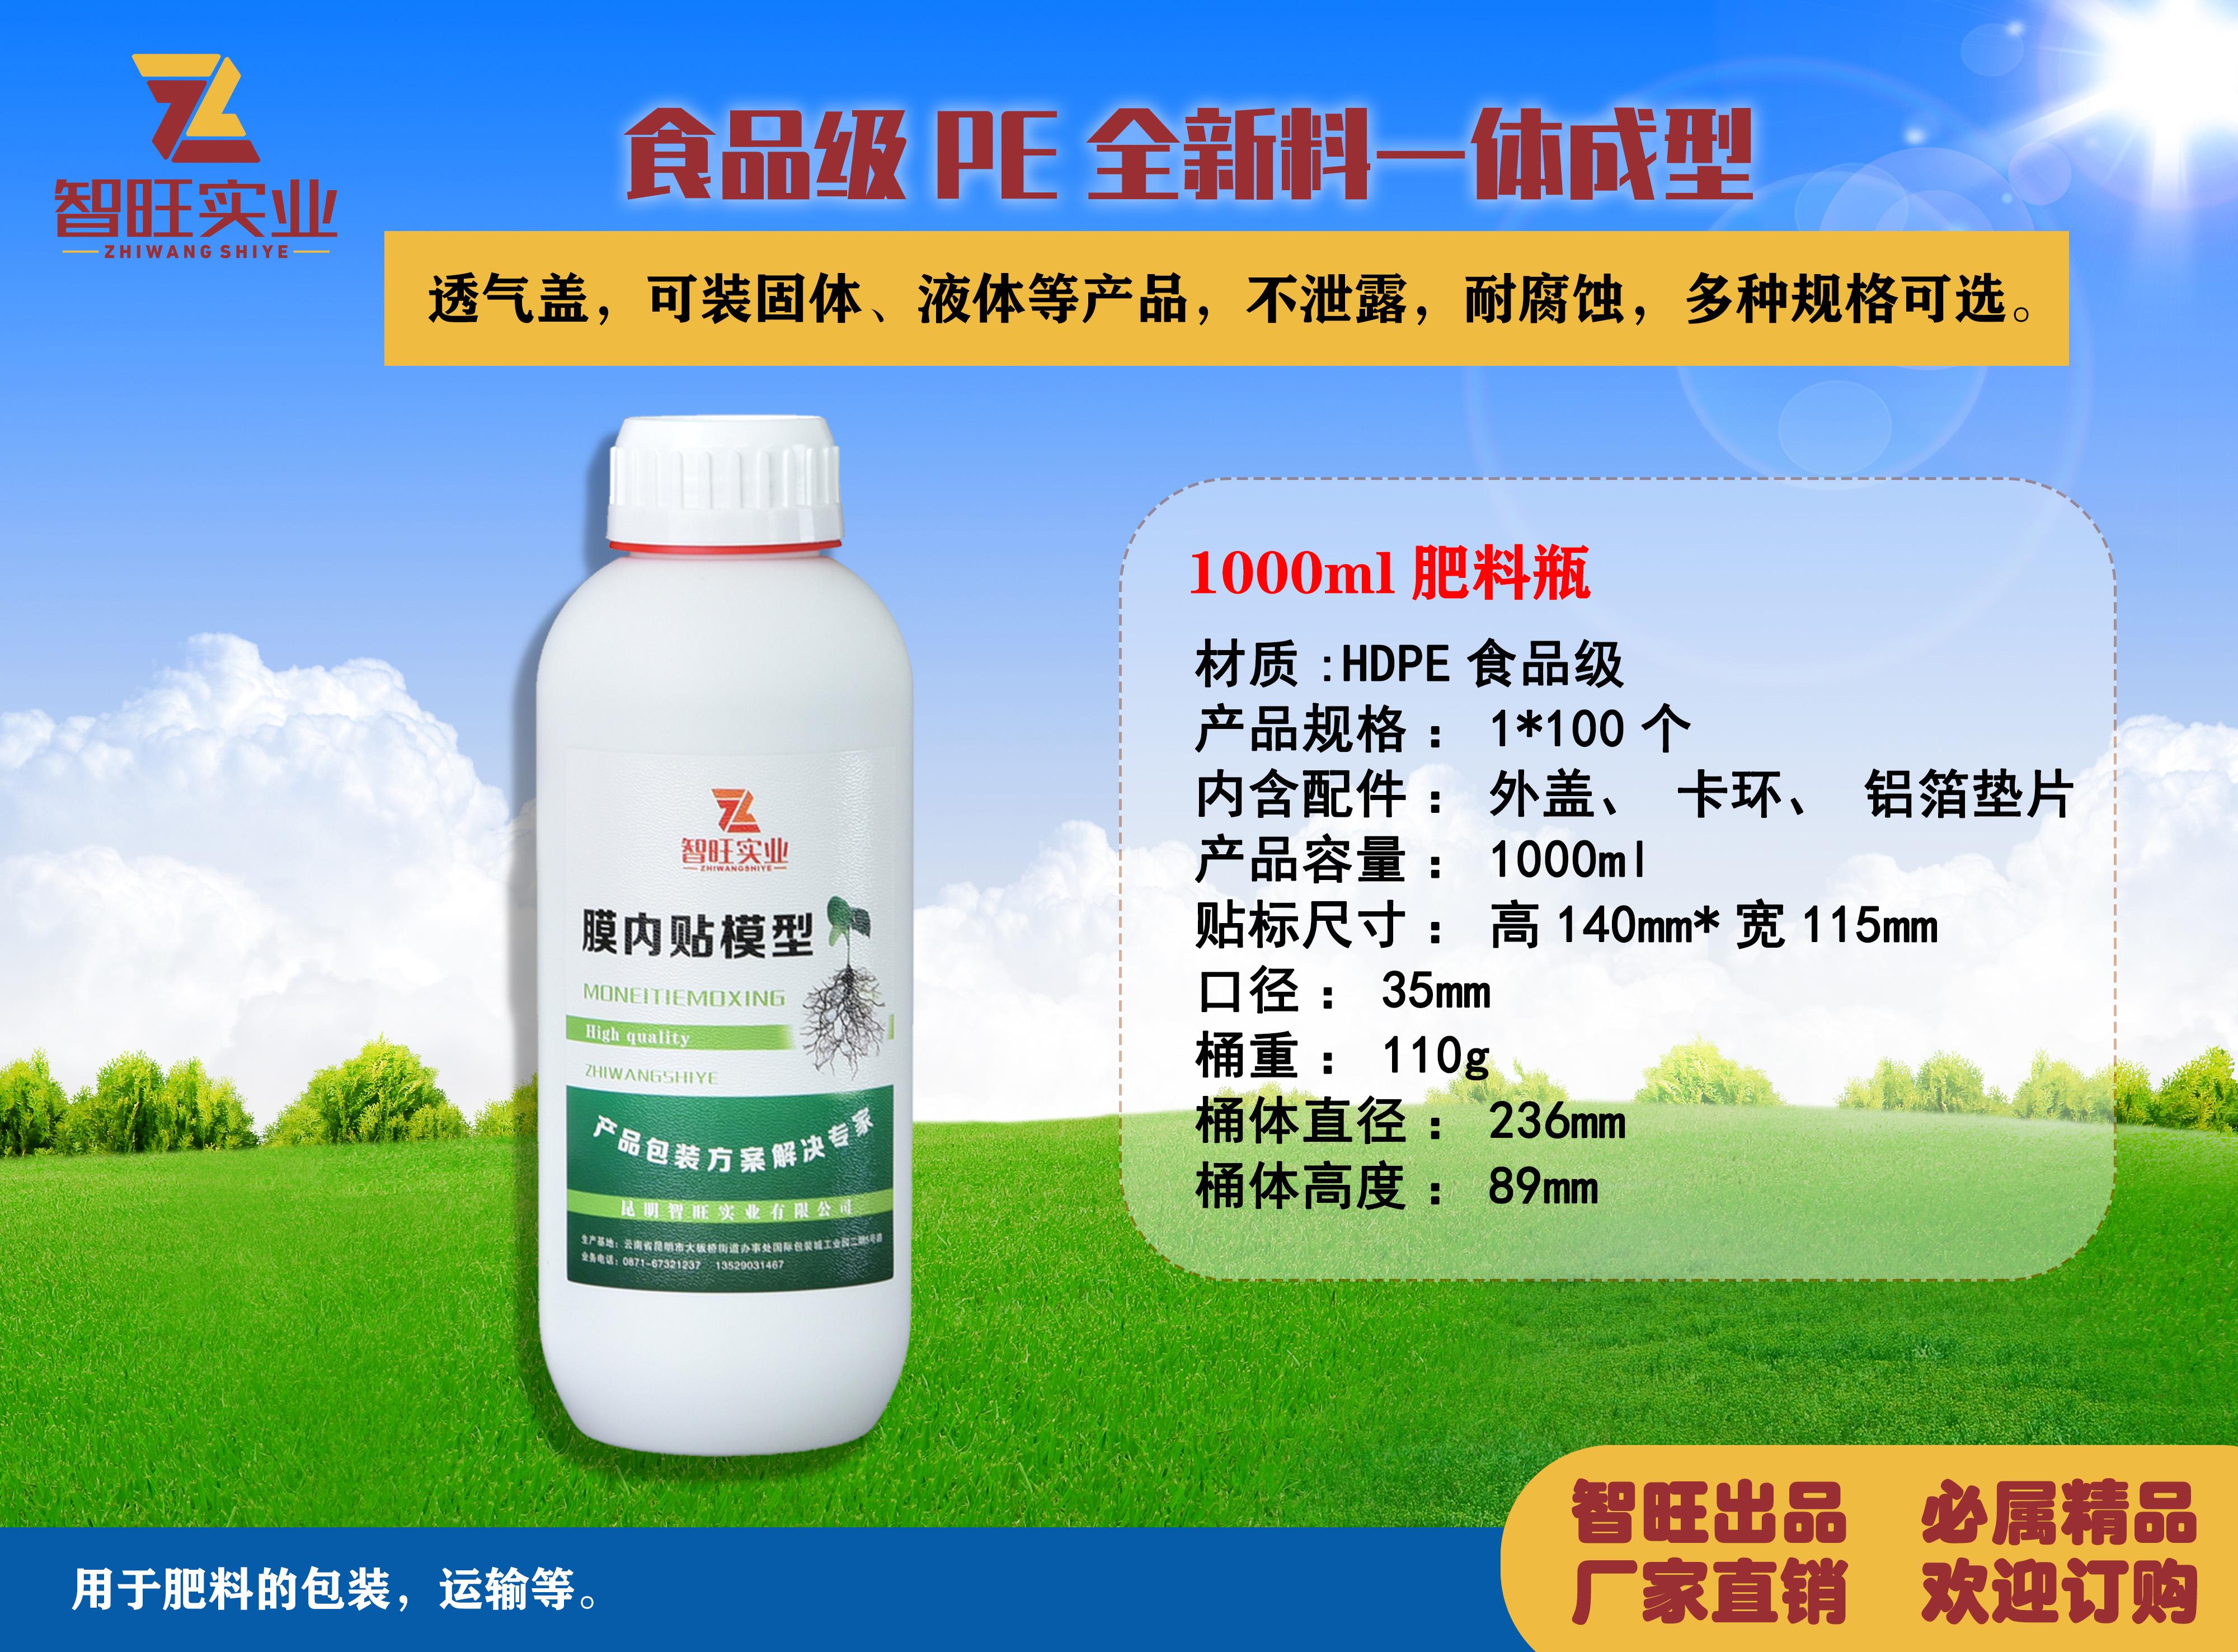 1000ml肥料瓶